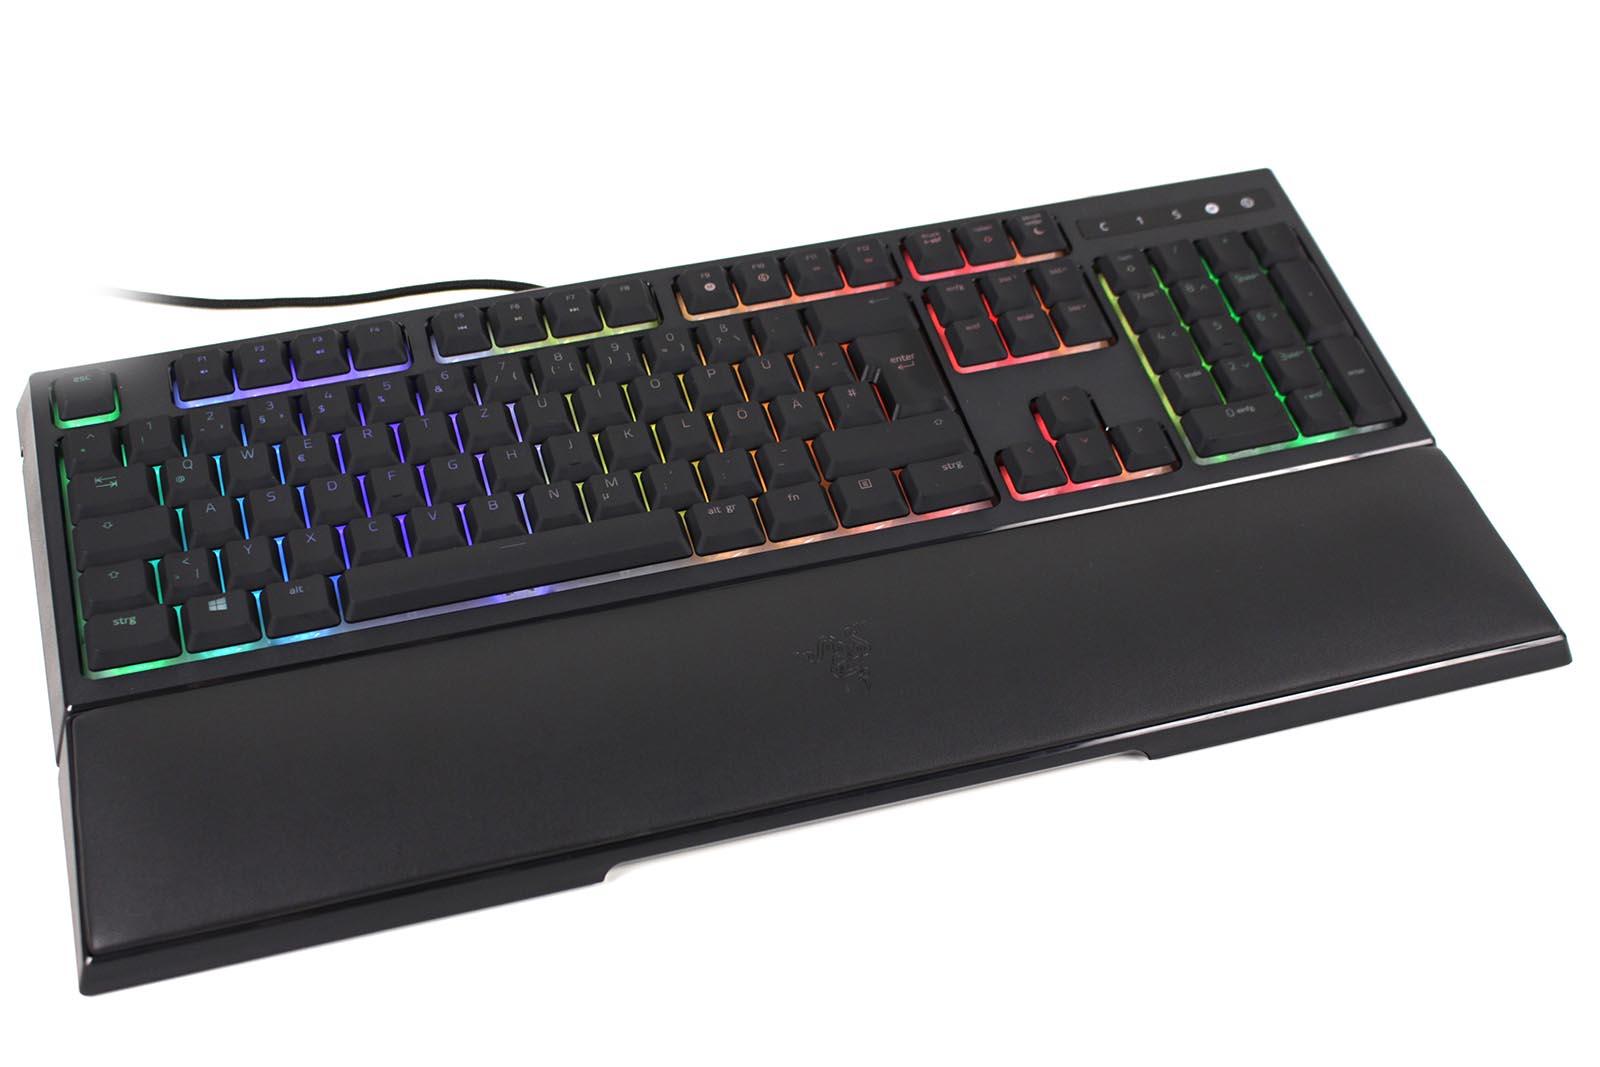 Tidssvarende Test: Razer Ornata Chroma Gaming-Tastatur - Allround-PC.com FP-16